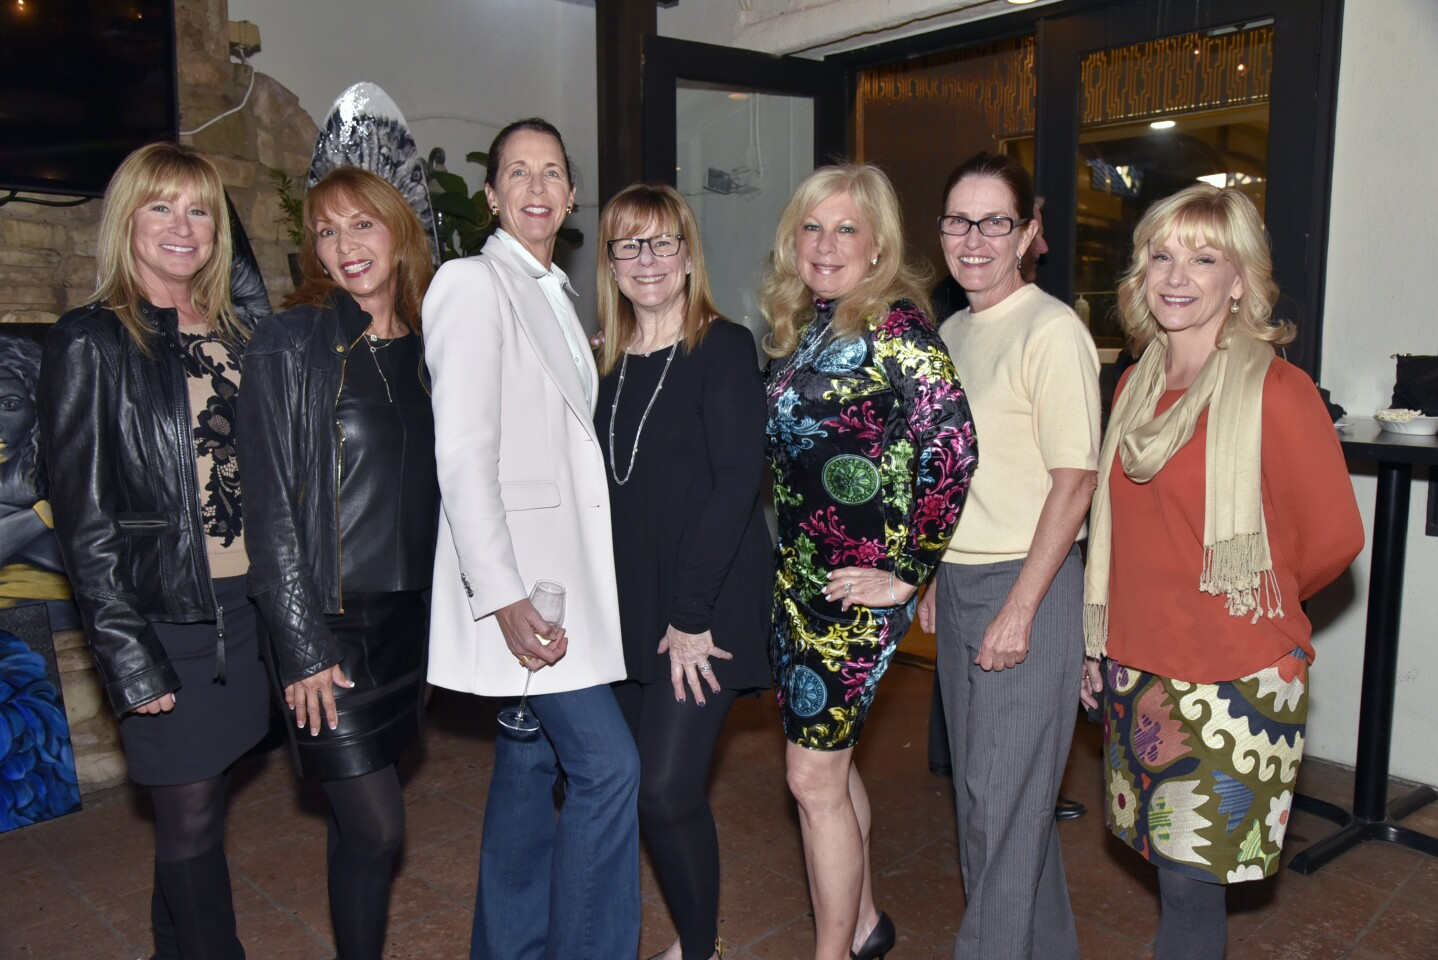 Liz O'Neill, Judy Judy, RSF Tea3 Foundation Treasurer Deana Ingall, Stelli Graff, Secretary Gina Jordan, Nancy Ryan, Toni Taves